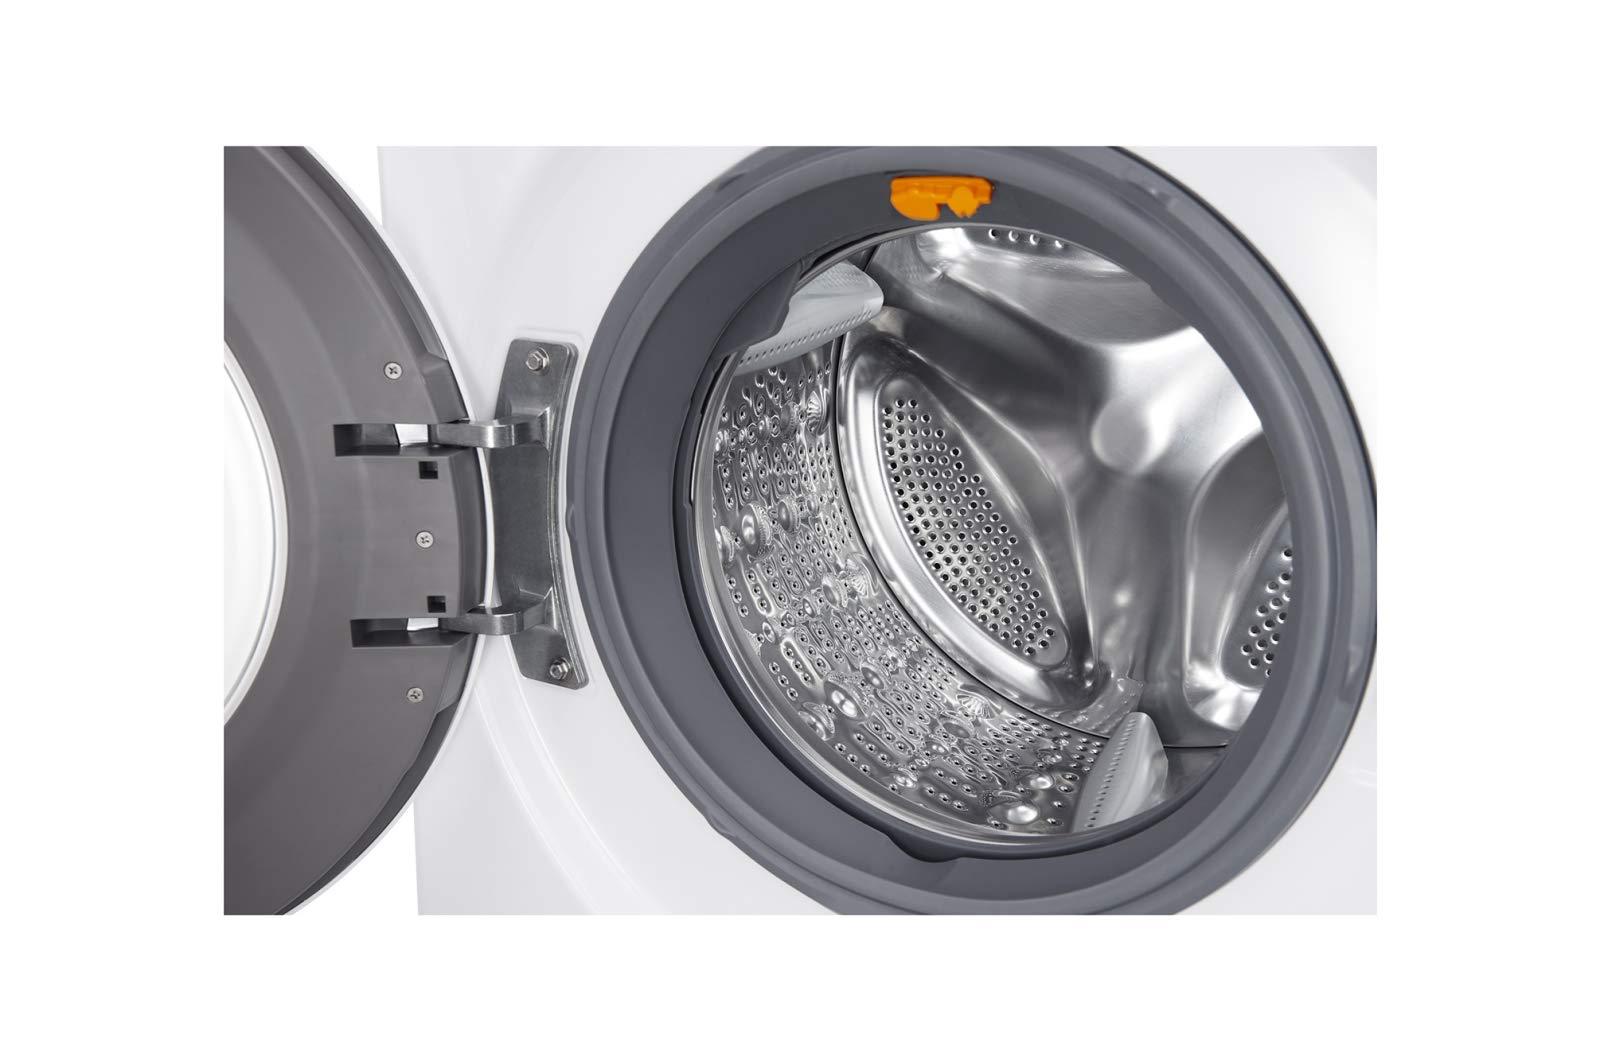 LG-F14WM10ATS1-Waschmaschine-Frontlader-A-1400-rpm-10-kilograms